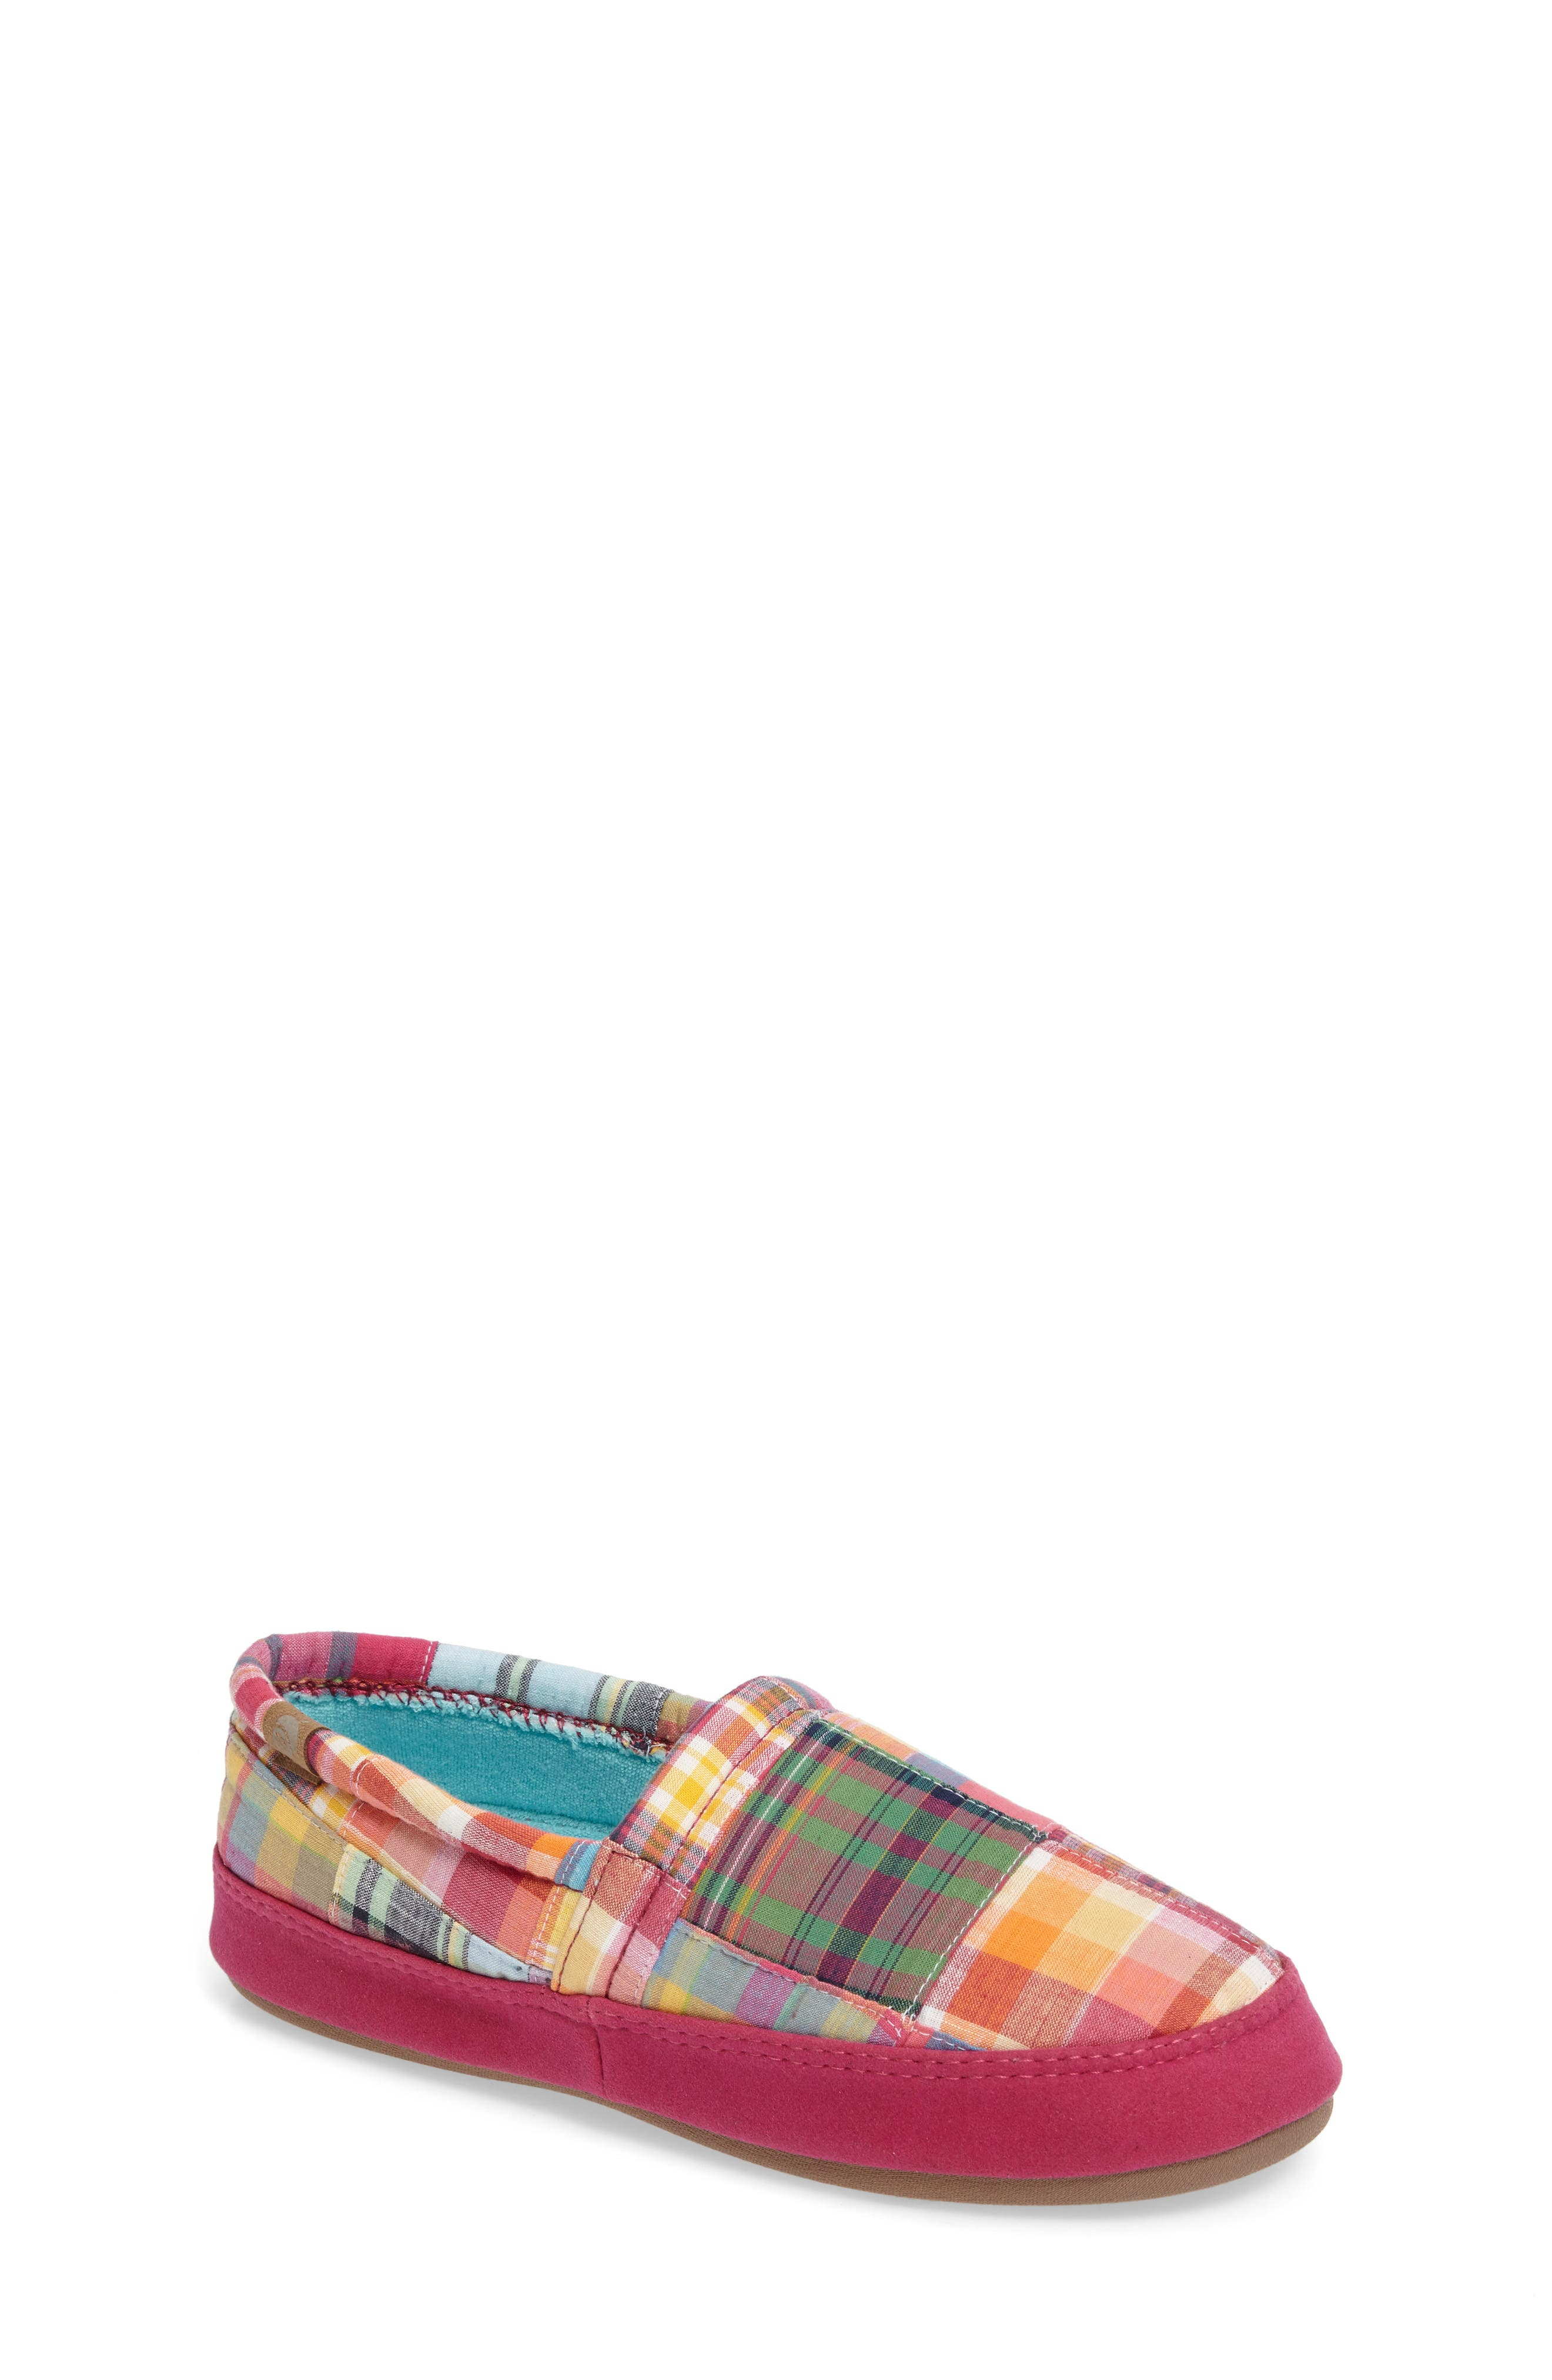 ACORN Summer Weight Moc Slipper, Bright Madras Fabric